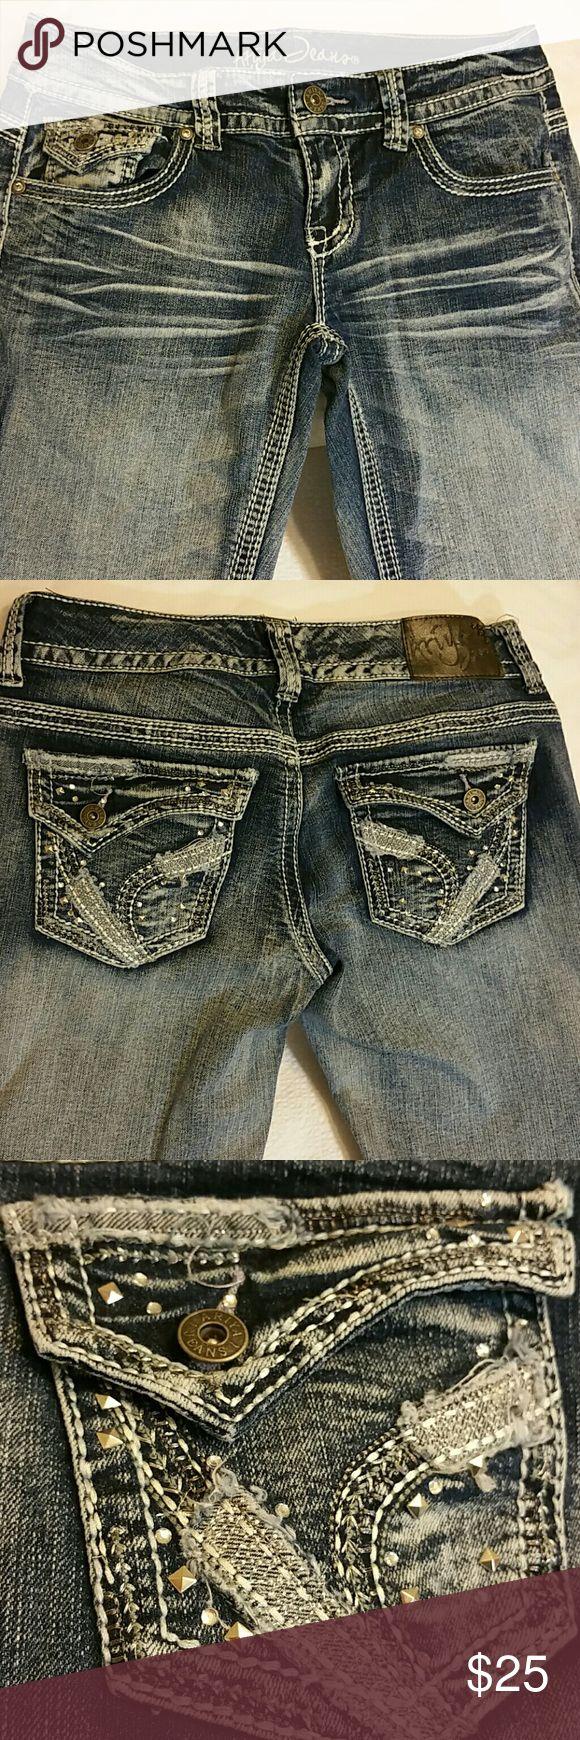 Ladies jeans, like new Low rise size 7/8 Ariya Jeans Straight Leg